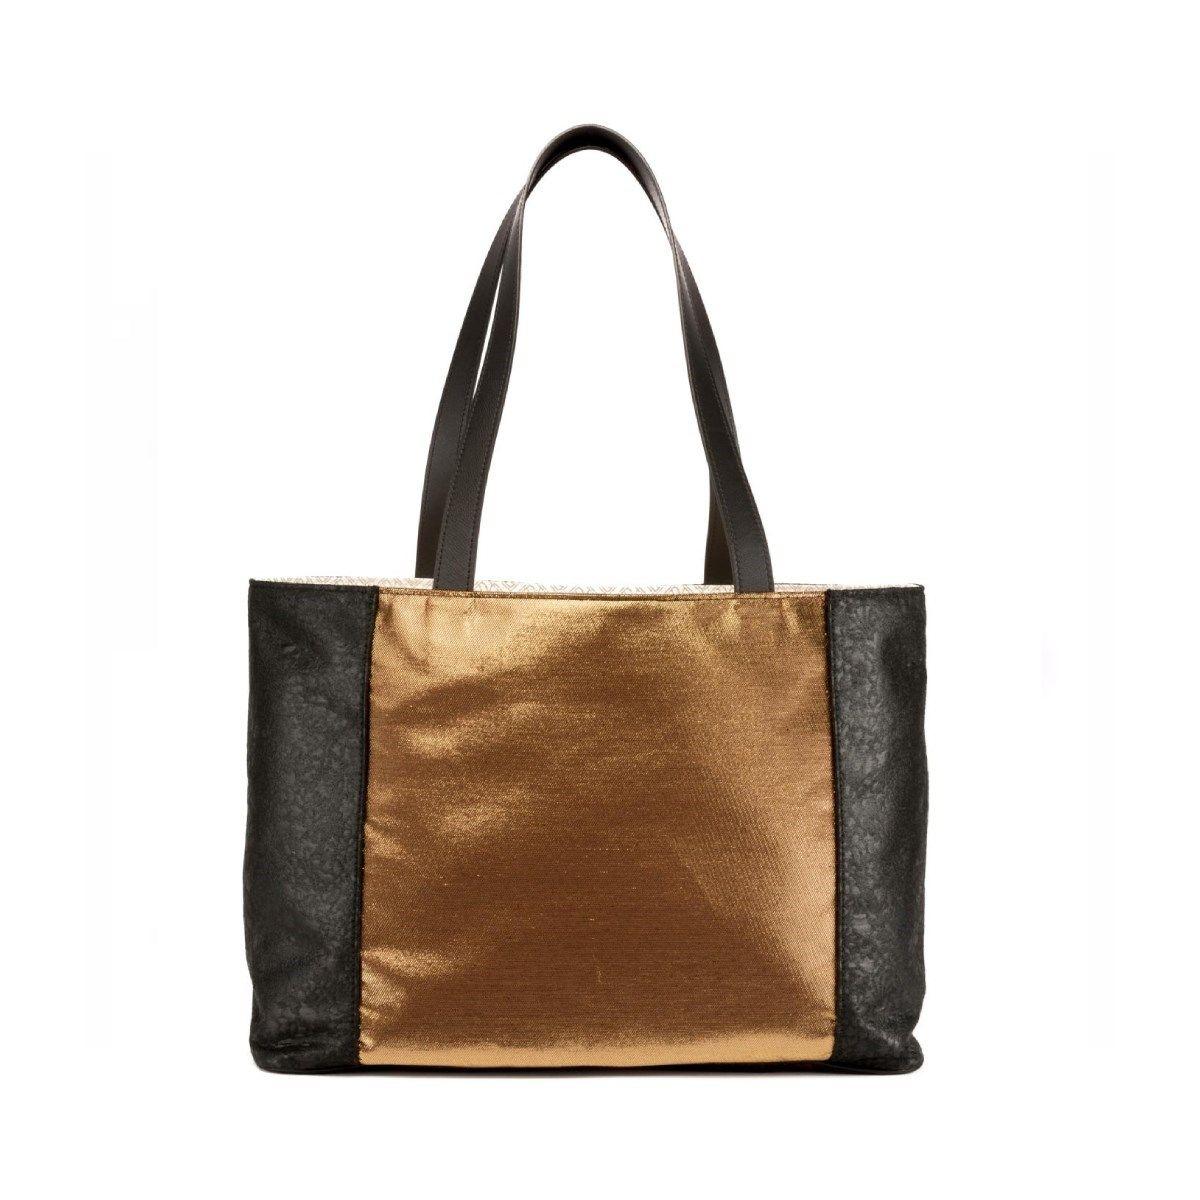 Grand sac Cabas tissus précieux Fil textile Escapade